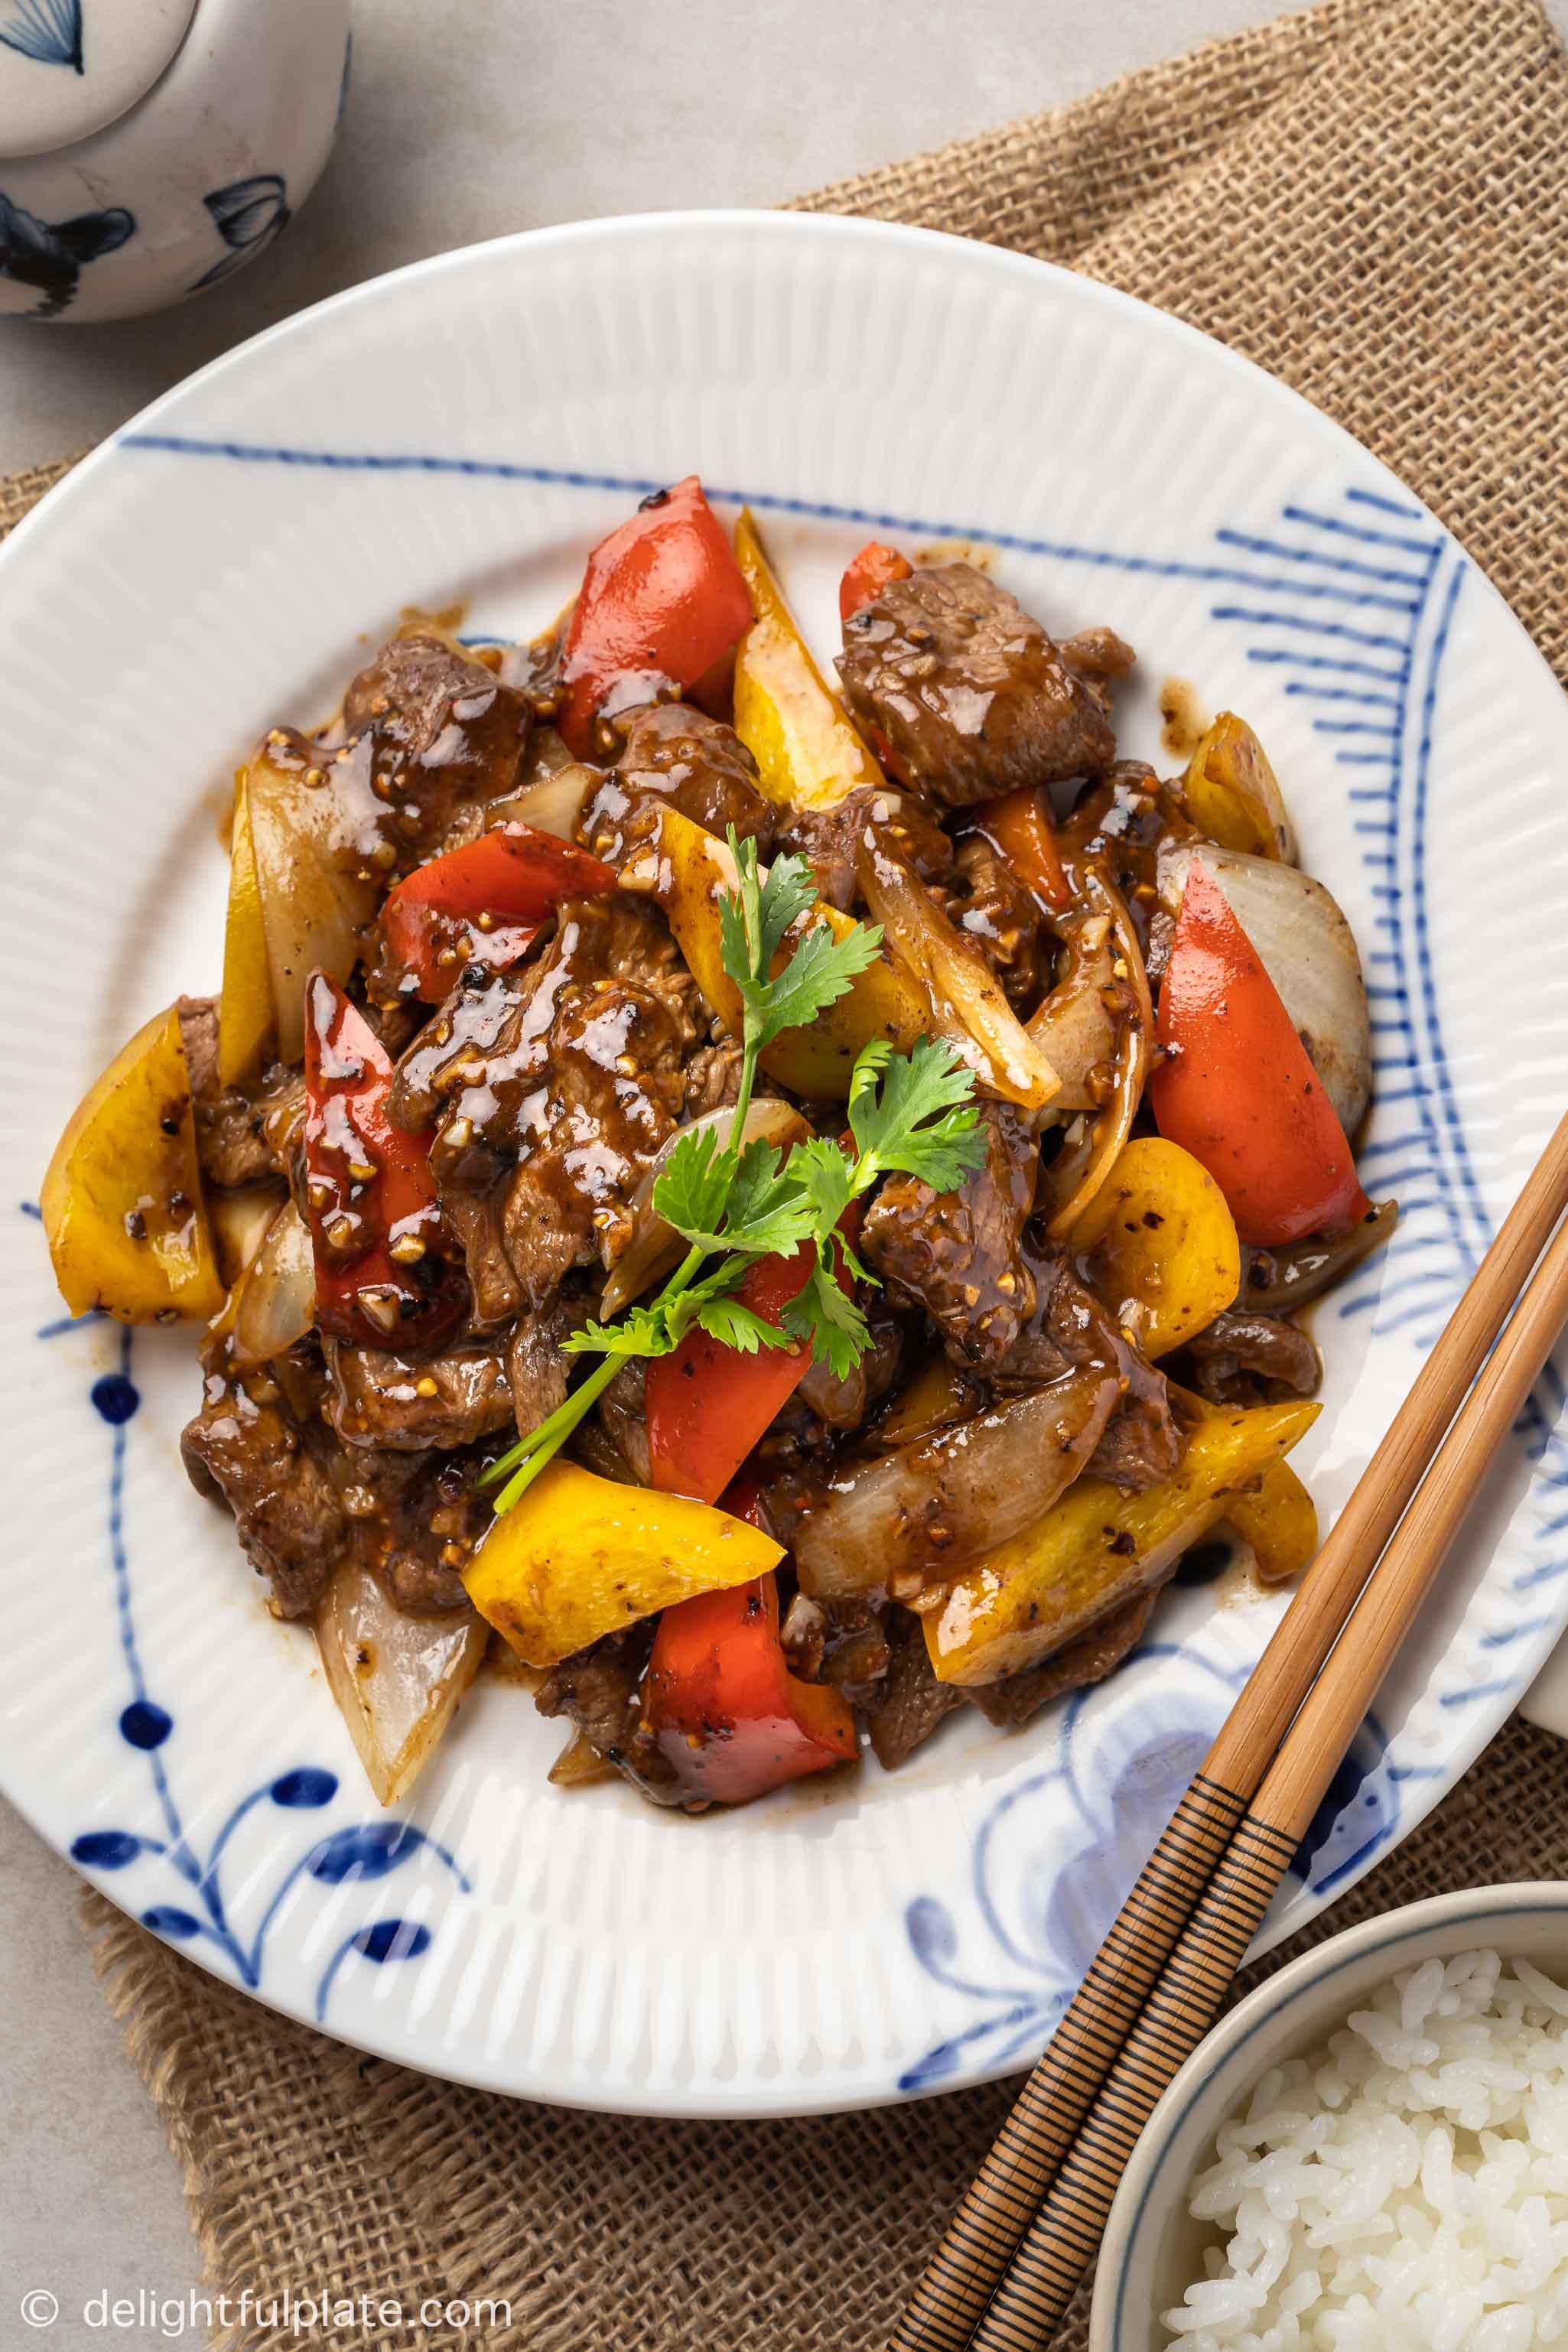 a plate of black pepper beef stir-fry